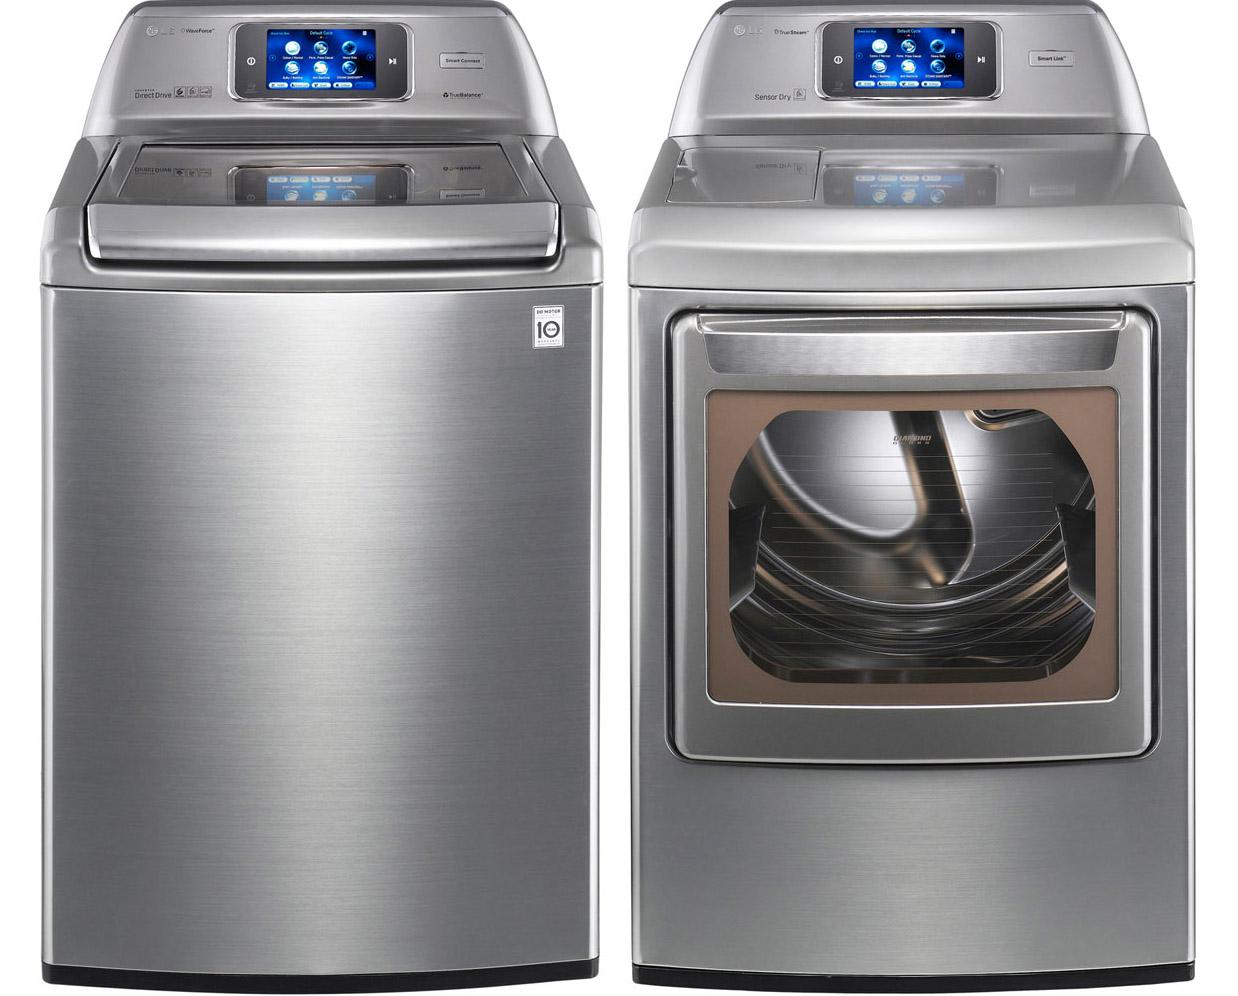 Lg Dryer Manufacturer Warranty ~ New lg graphite top load washer steam electric dryer